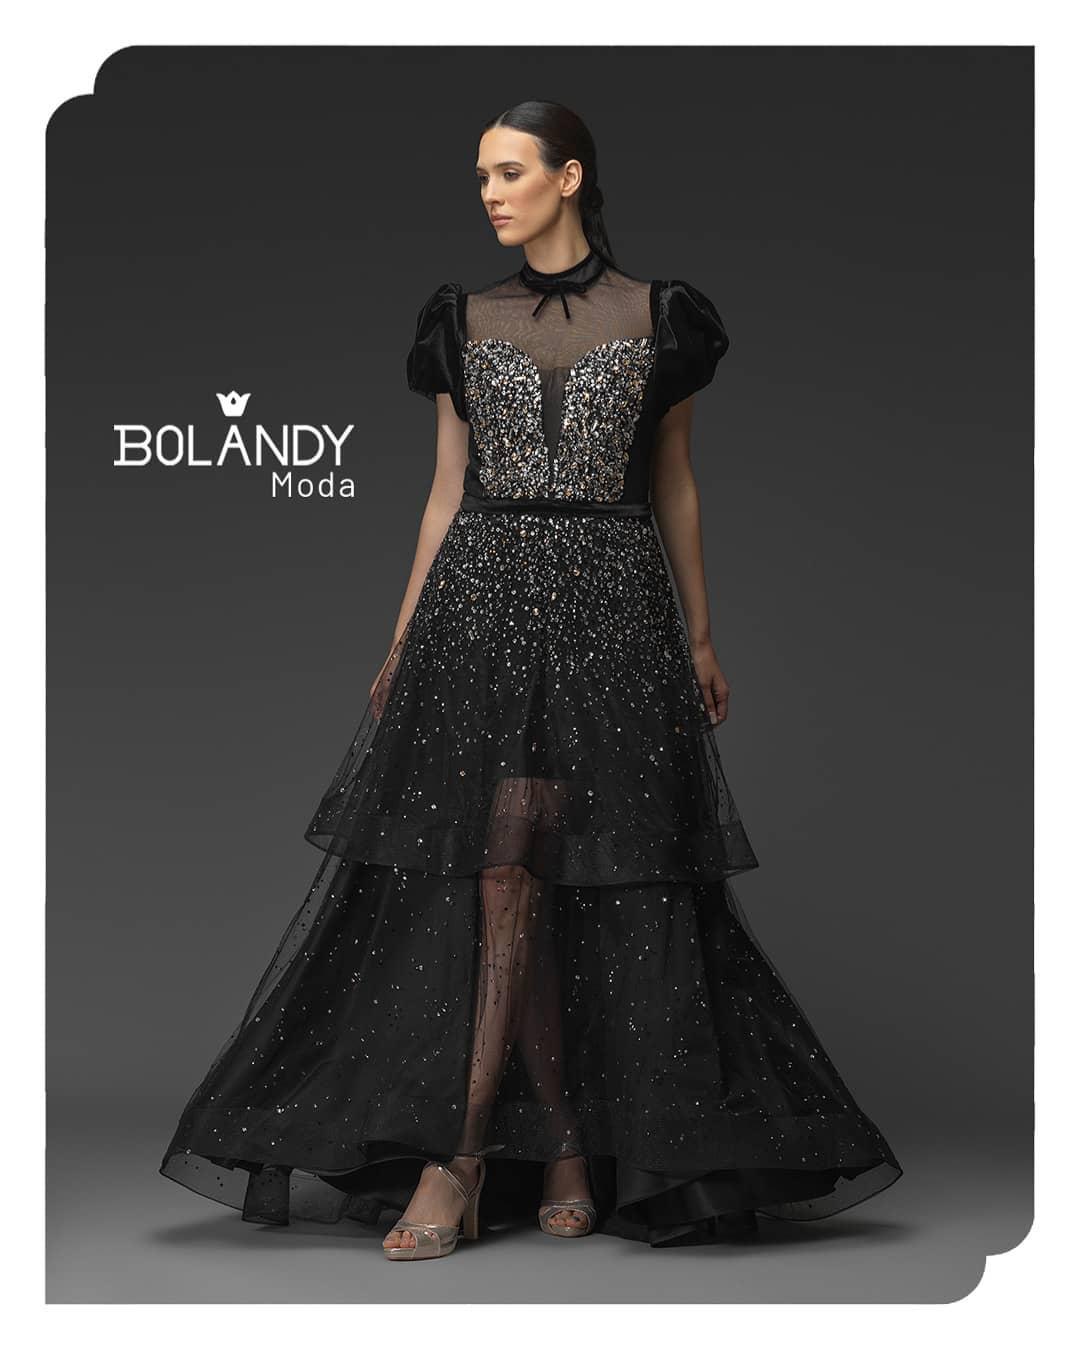 مزون لباس عروس محبوبه بلندی